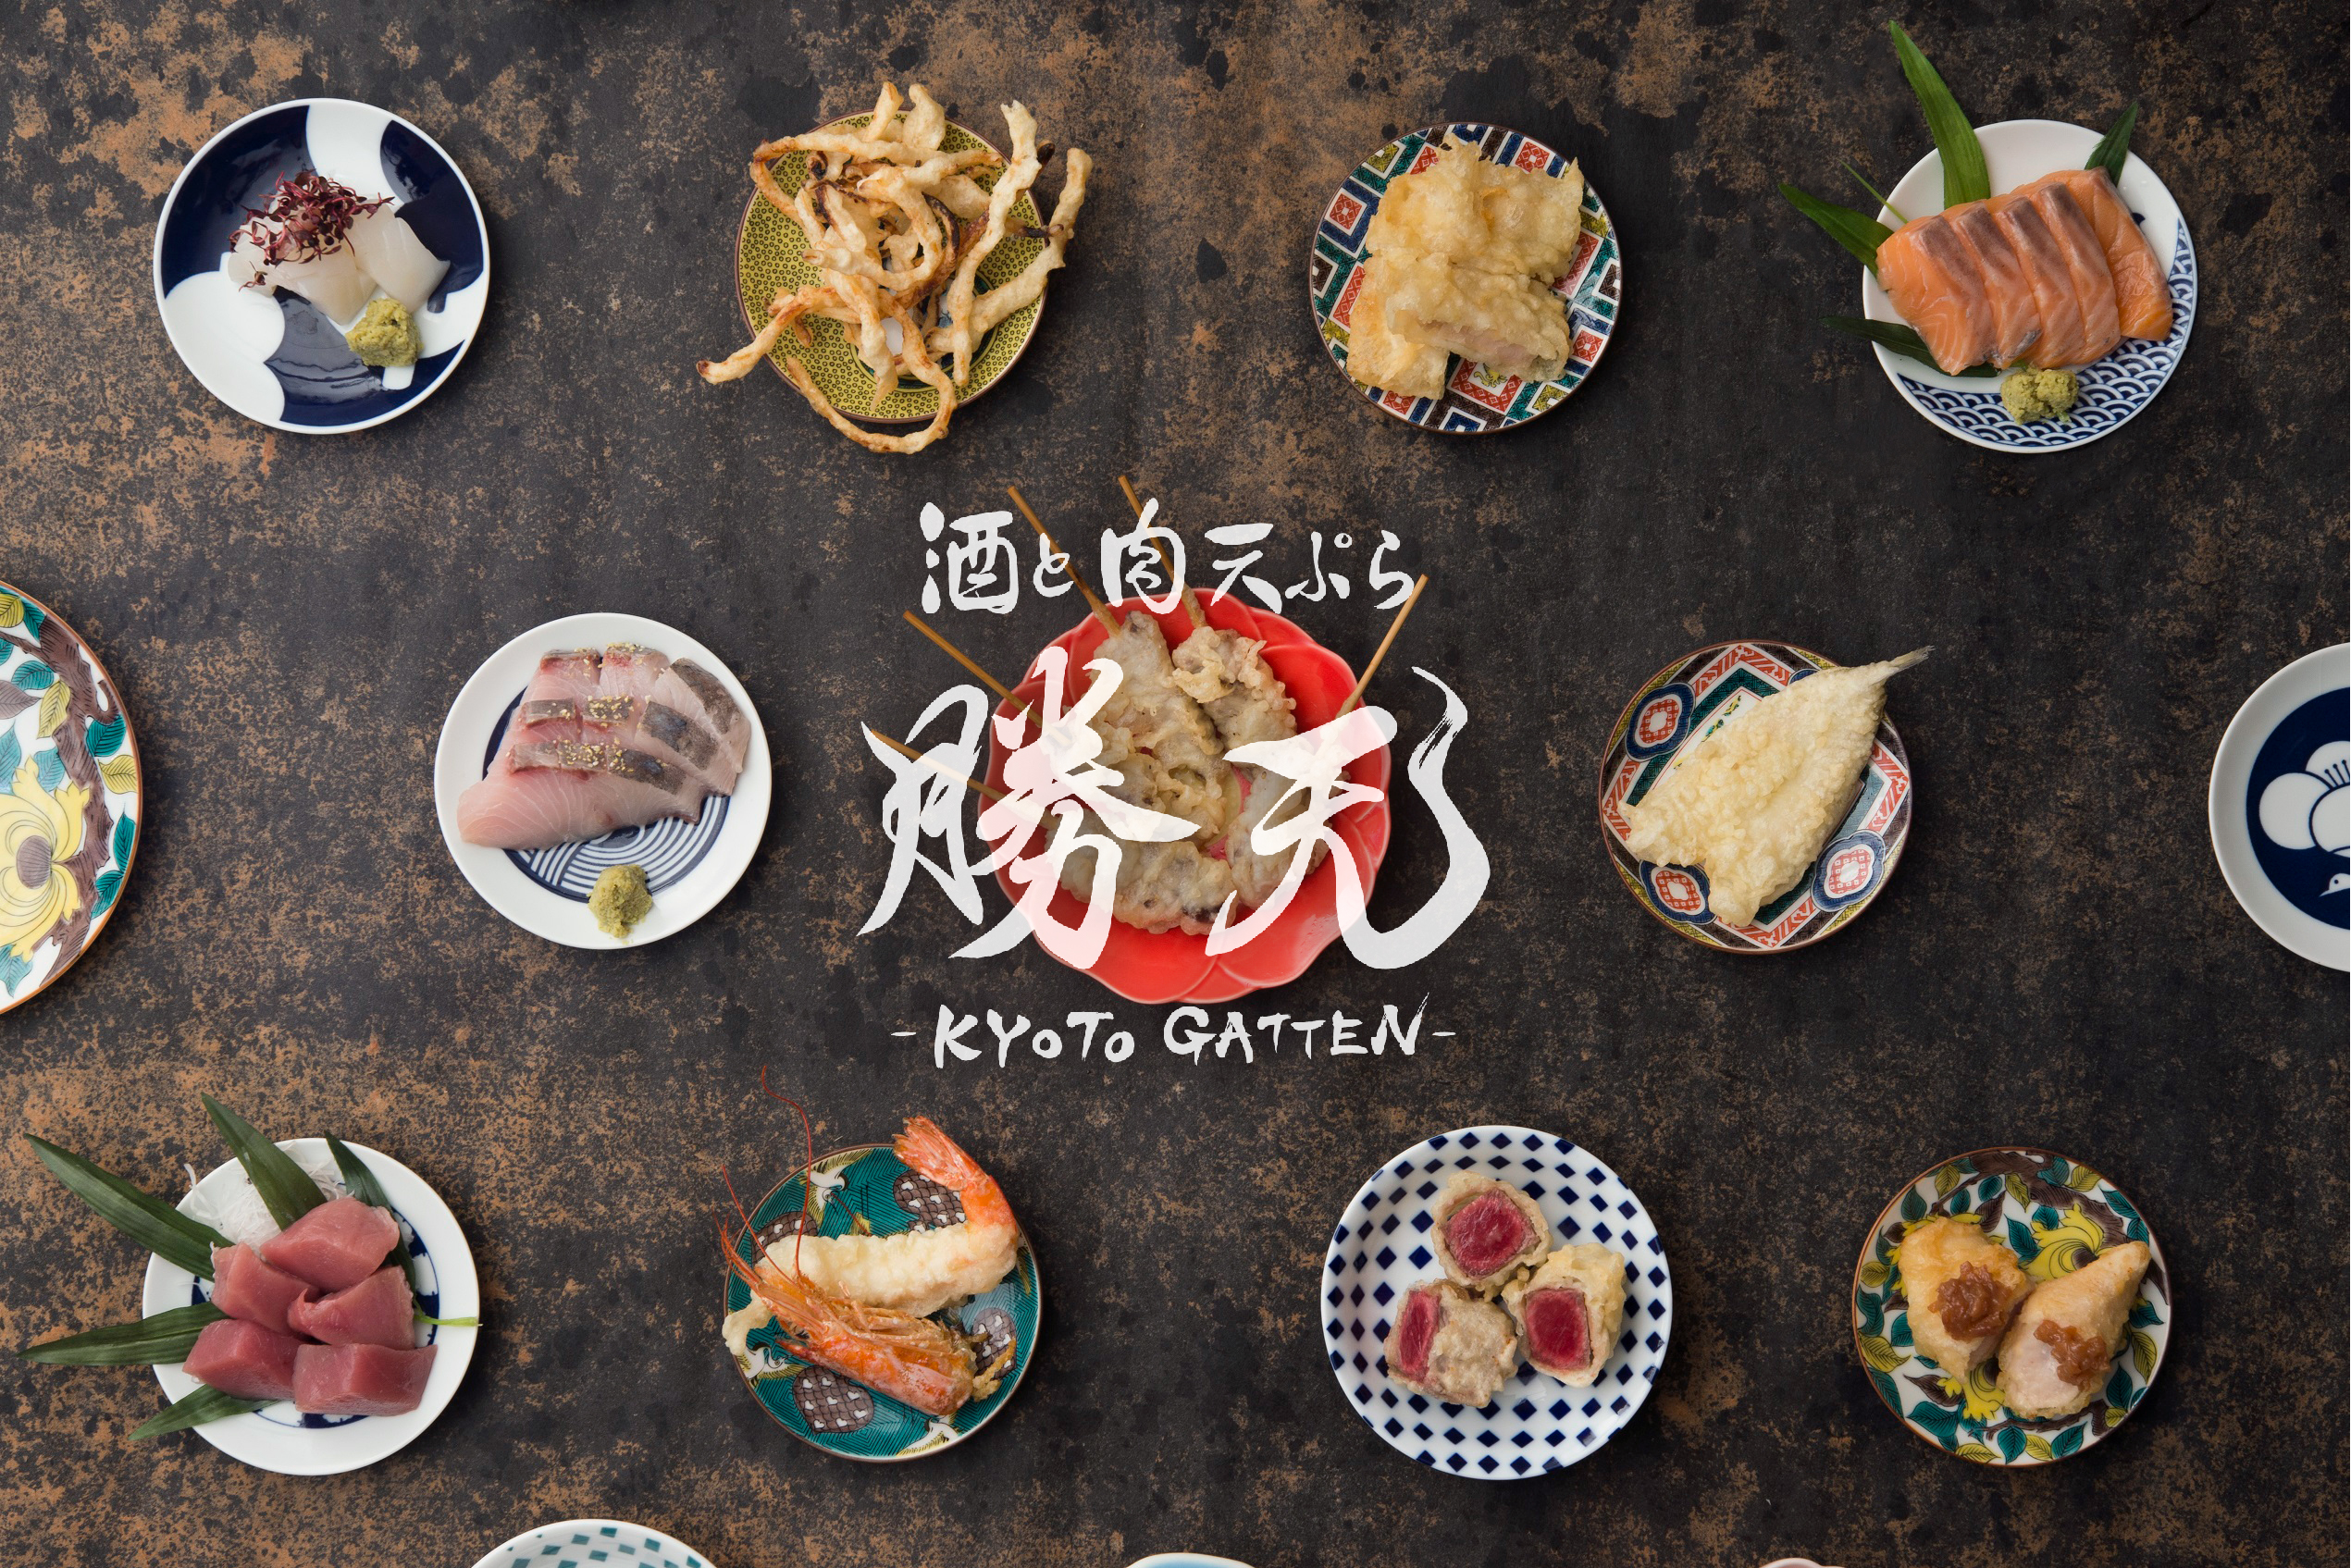 【Press Release】新業態!《肉天ぷら》が名物の「天ぷらPUB」が京都・先斗町に誕生!10月6日(金)酒と肉天ぷら『勝天-KYOTO GATTEN-』グランドオープン!